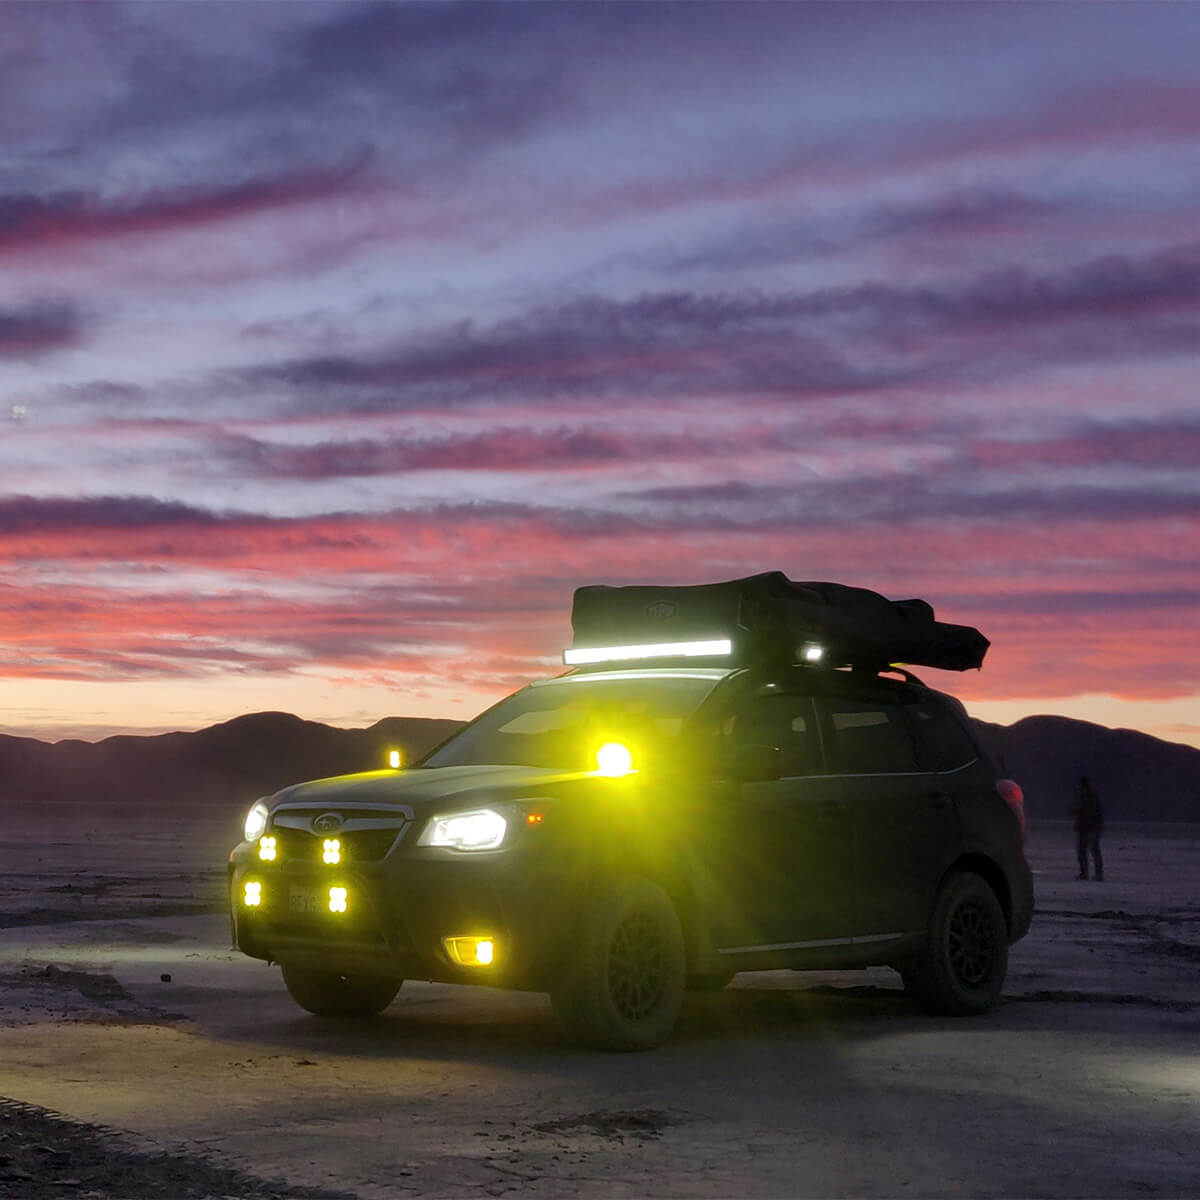 Stedi Australia 40.5″ ST2K Curved LED Light Bar and Baja Designs XL-R Sport LED Lights